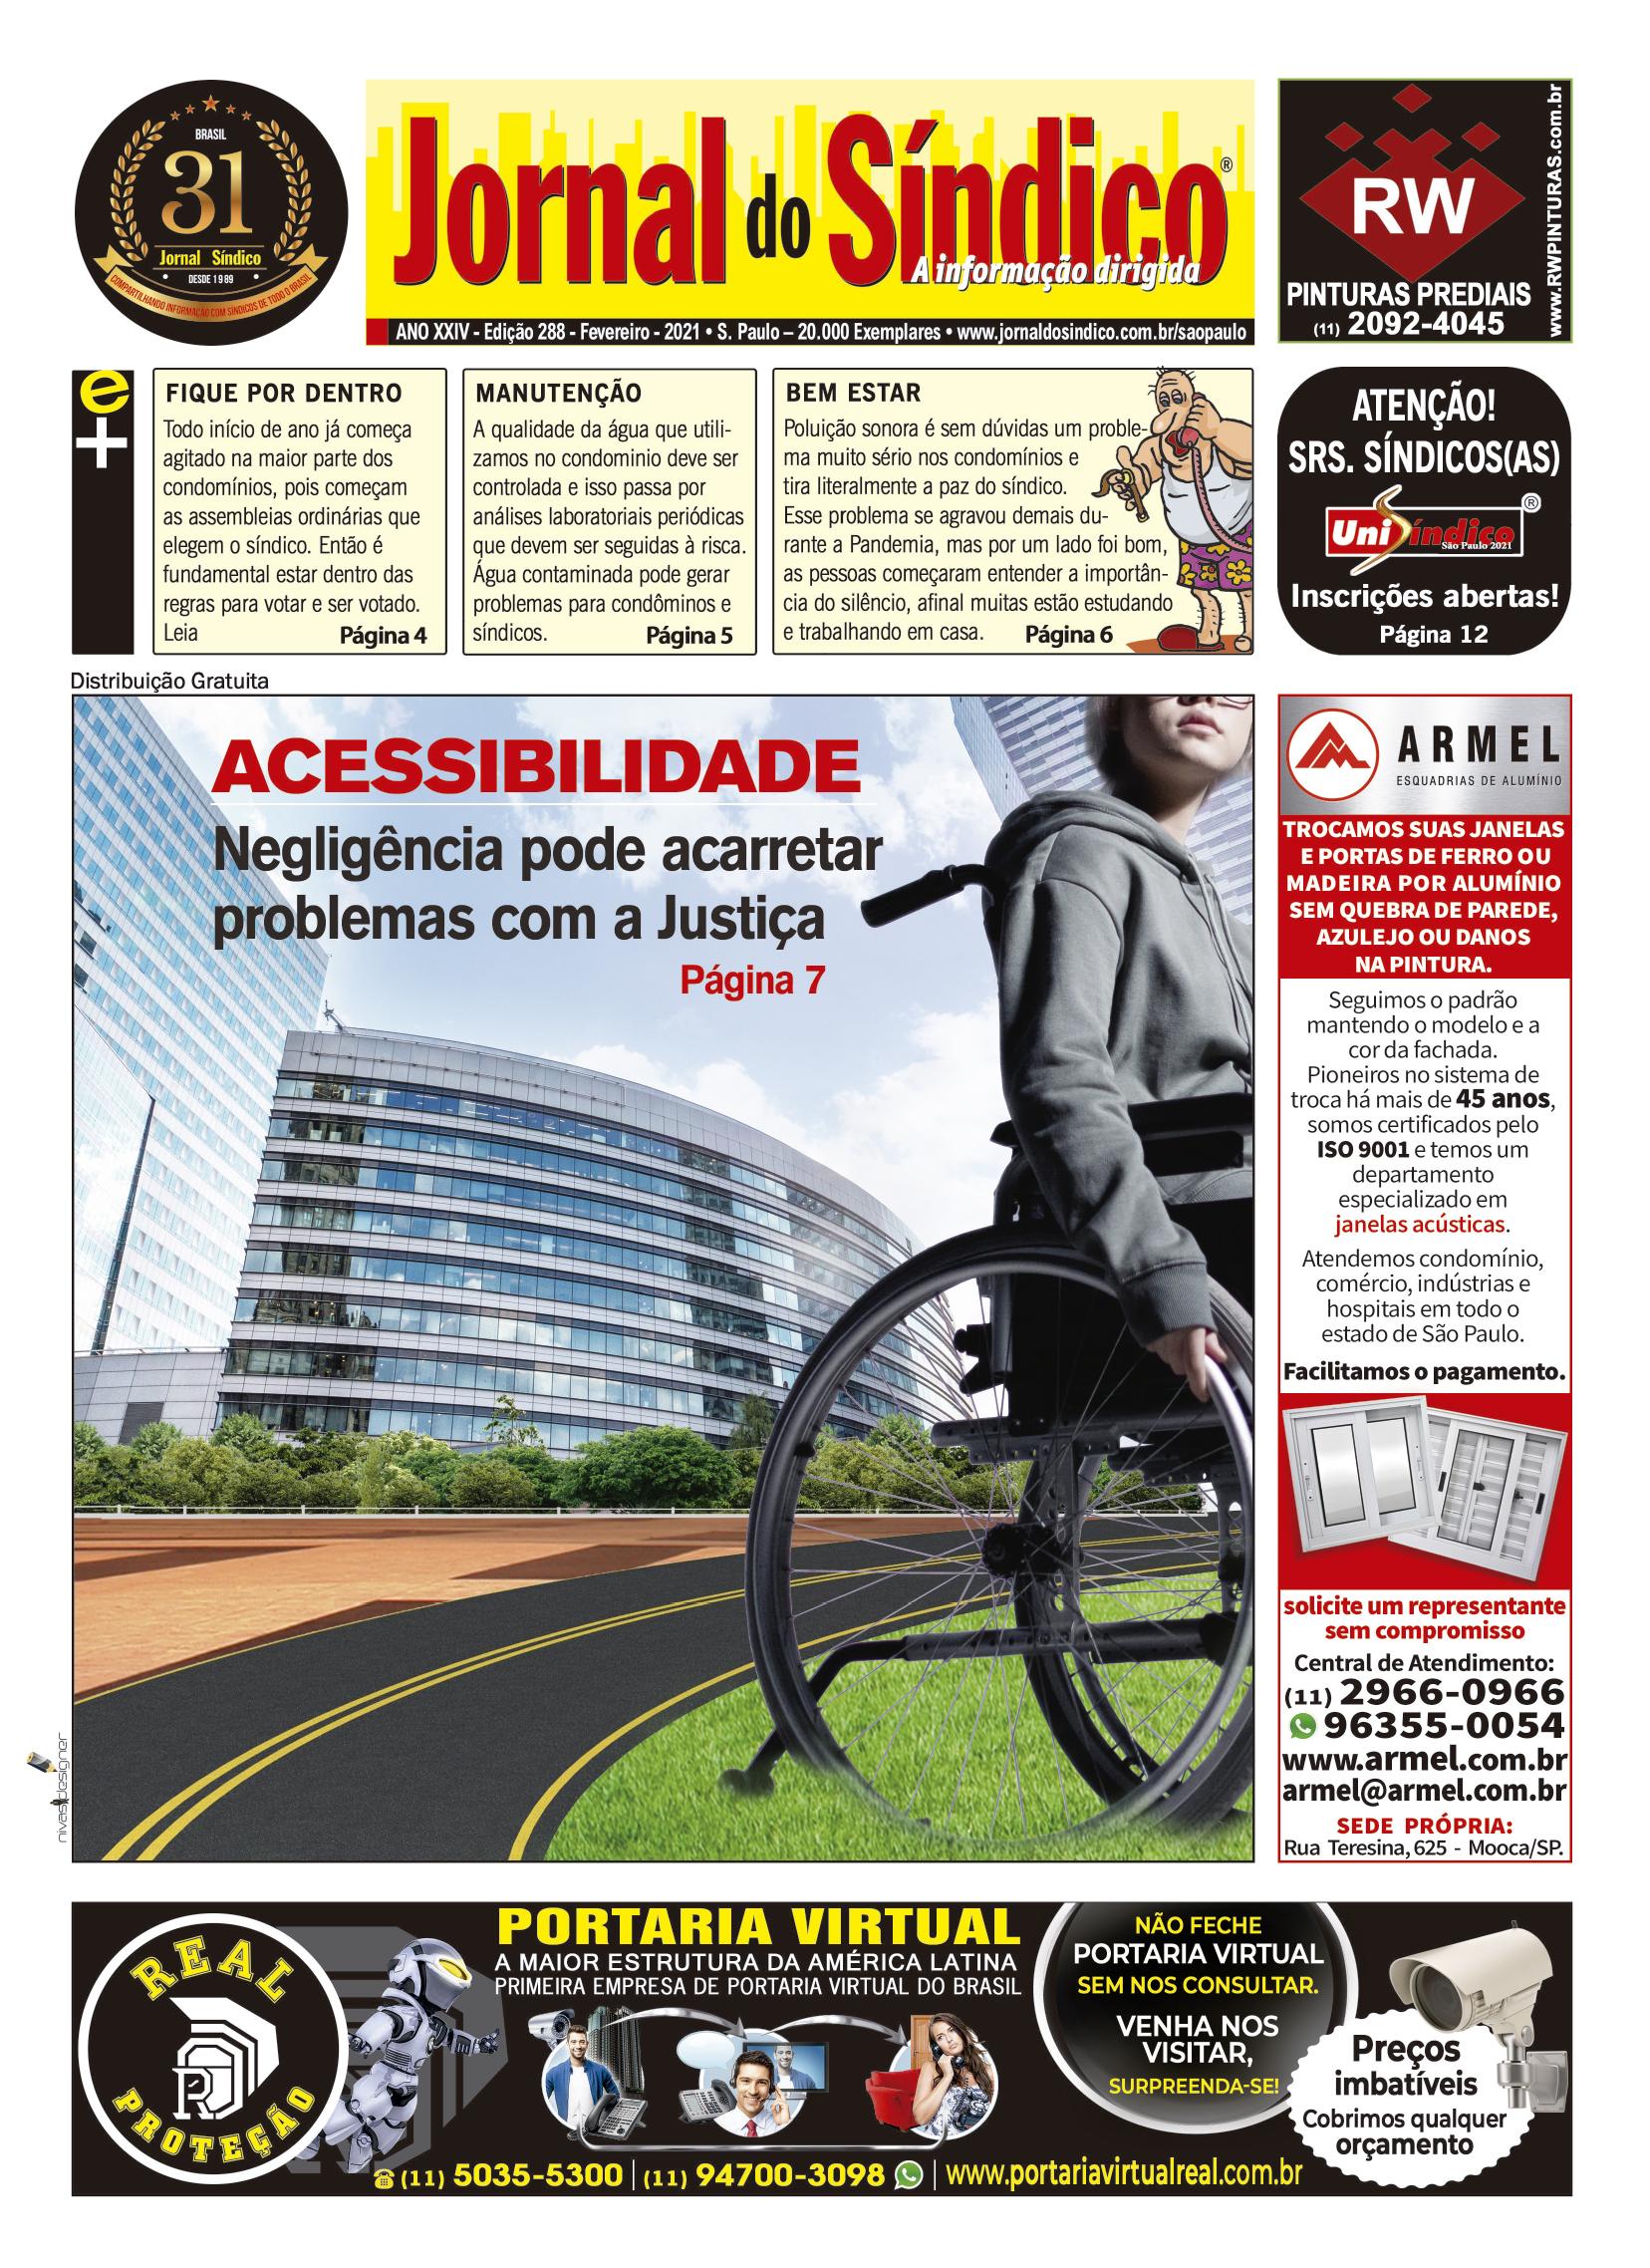 Jornal-Ediç 288 - Fevereiro 2021.indd